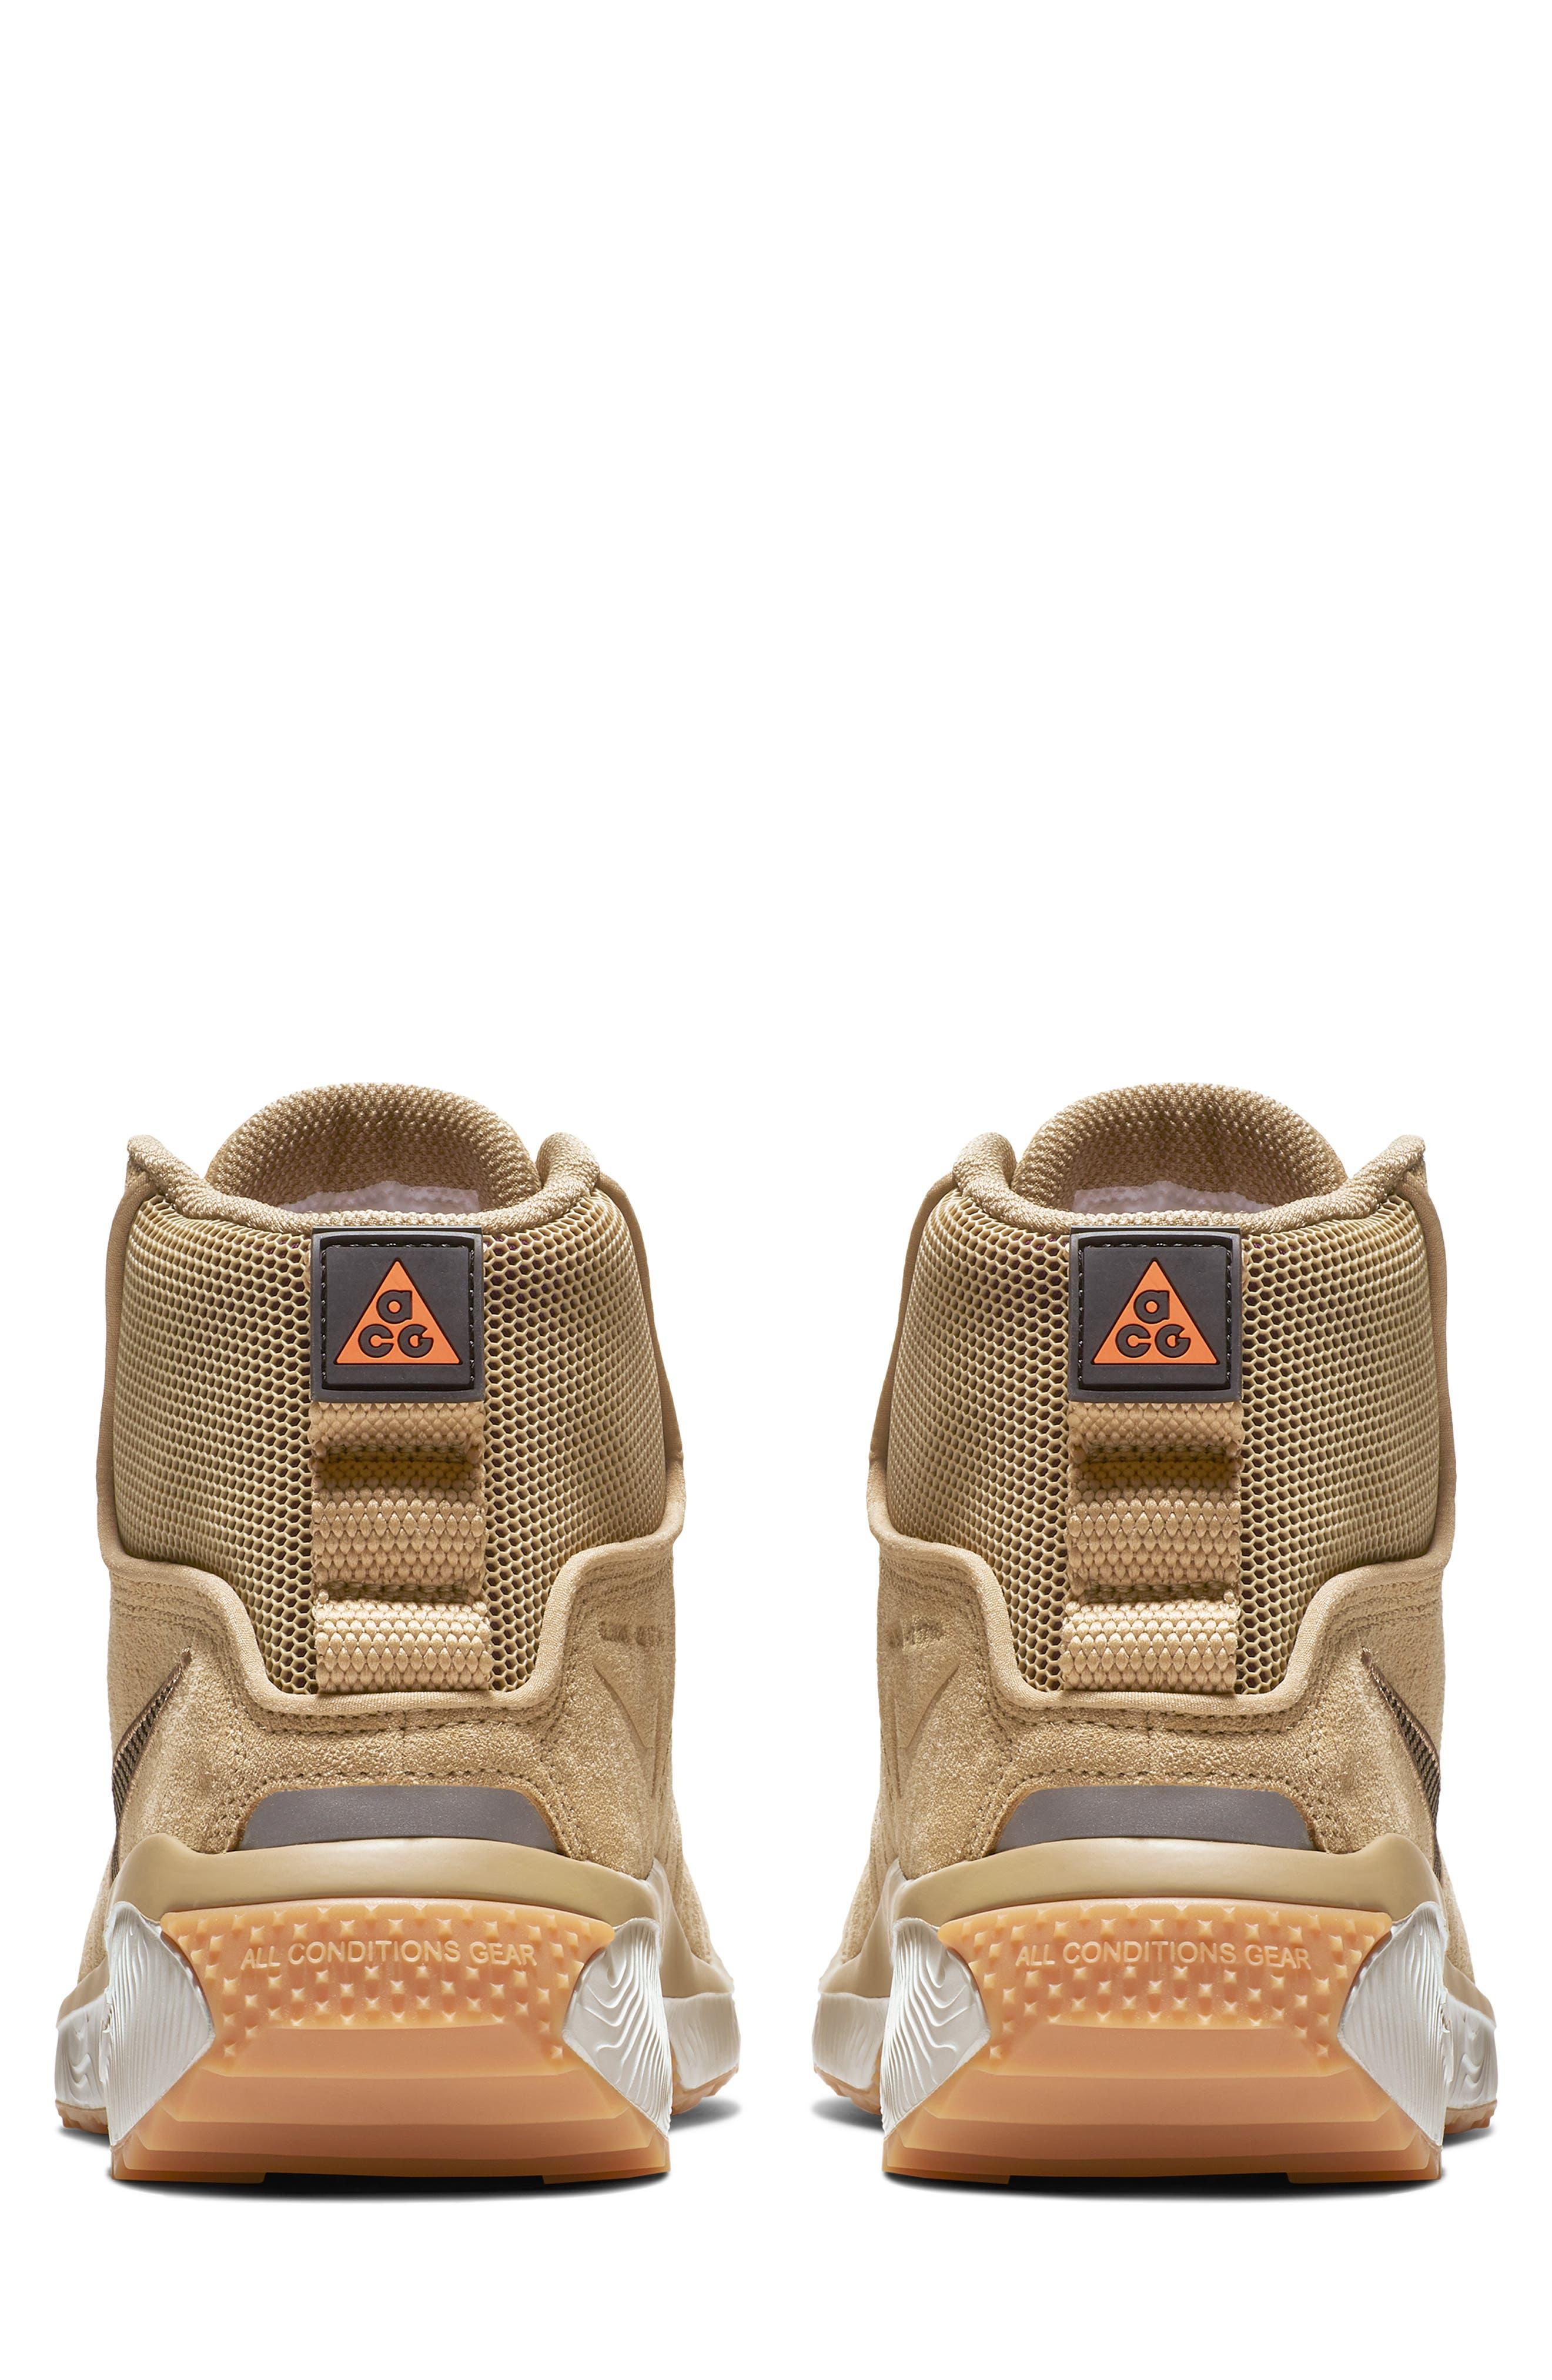 ACG Angels Rest Sneaker,                             Alternate thumbnail 2, color,                             PARACHUTE BEIGE/ YUKON BROWN